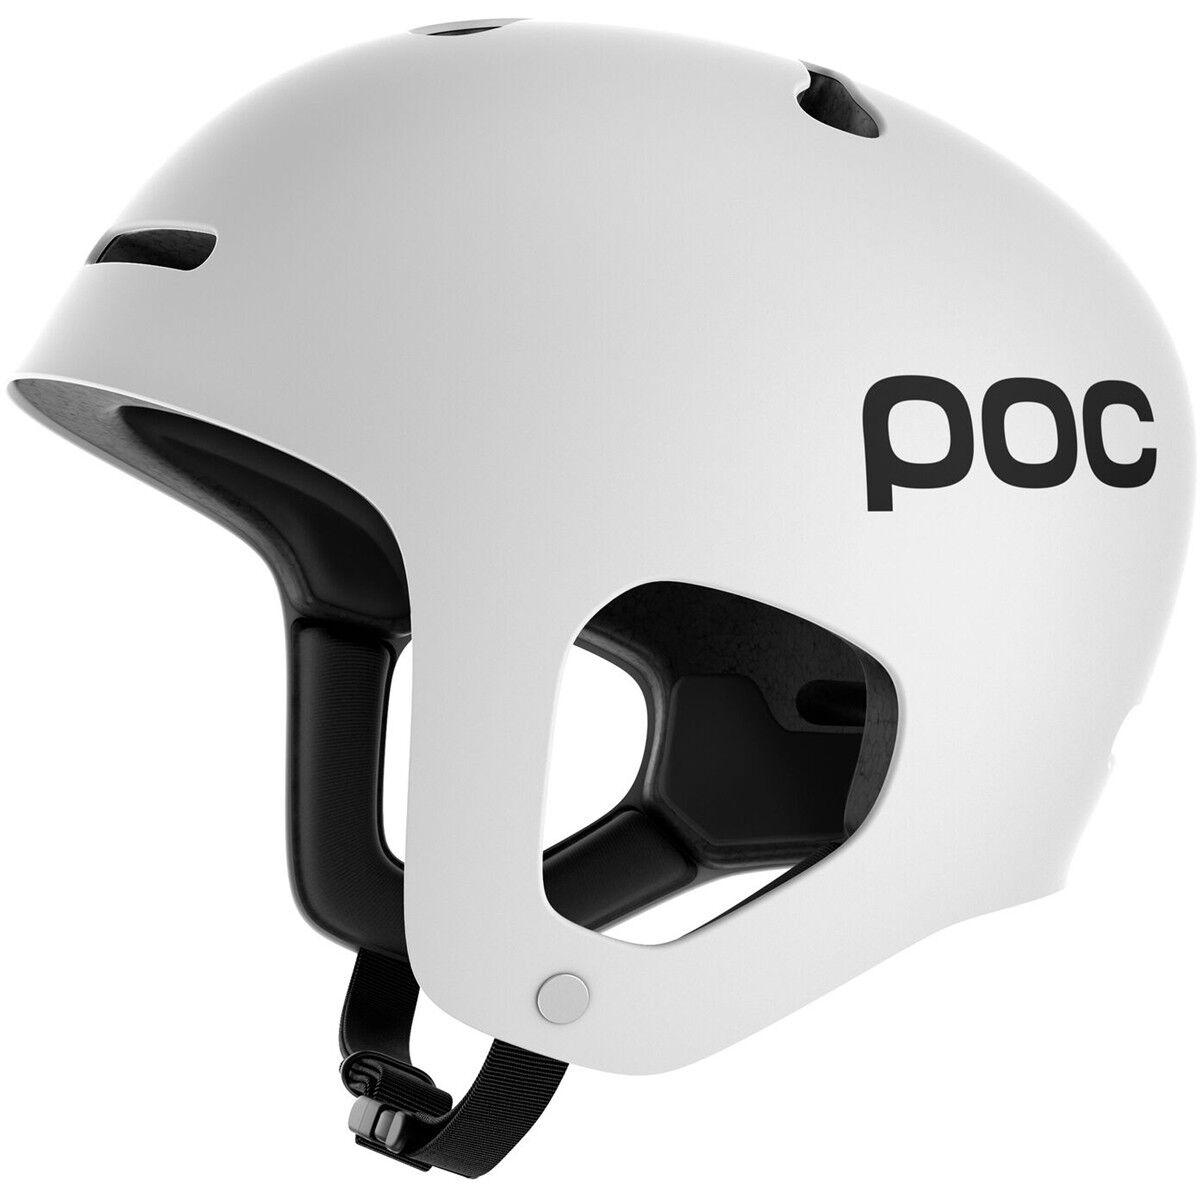 Poc Auric Snow Ski Skiing Helmet Hydrogen White Medium Large M L 55 58 cm